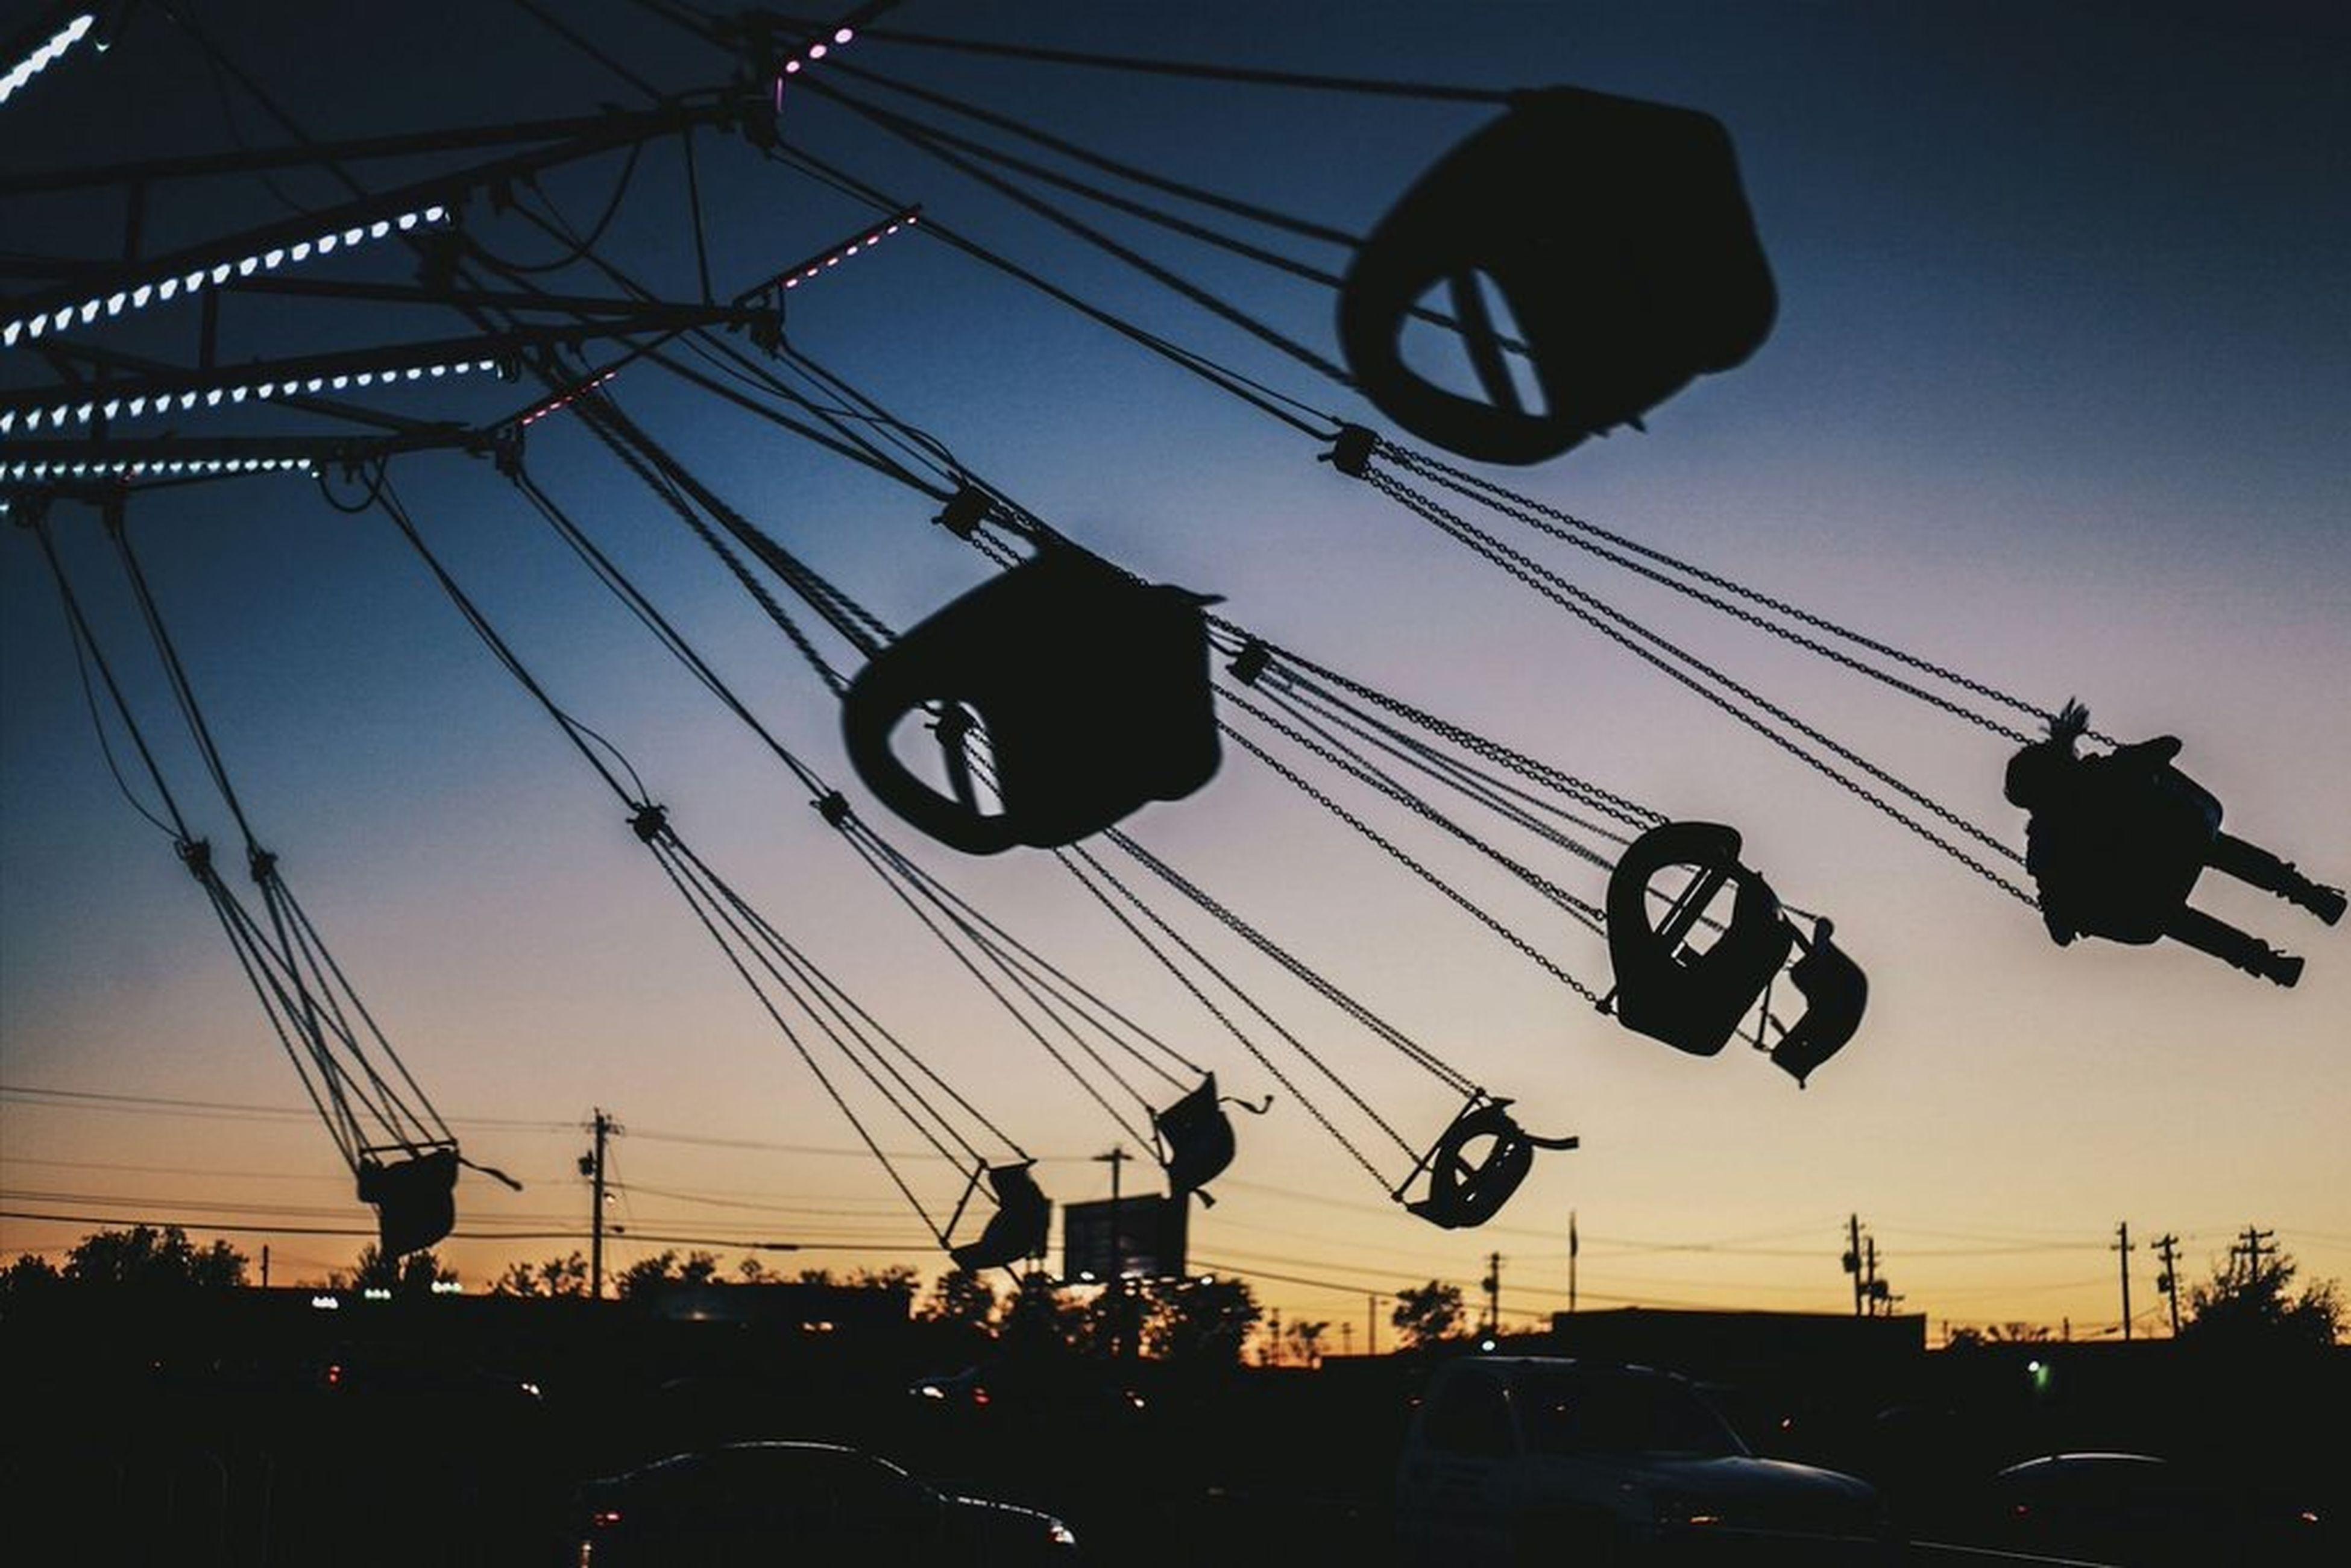 transportation, silhouette, low angle view, sunset, mode of transport, sky, power line, large group of people, leisure activity, cable, men, amusement park, dusk, lifestyles, enjoyment, car, person, arts culture and entertainment, land vehicle